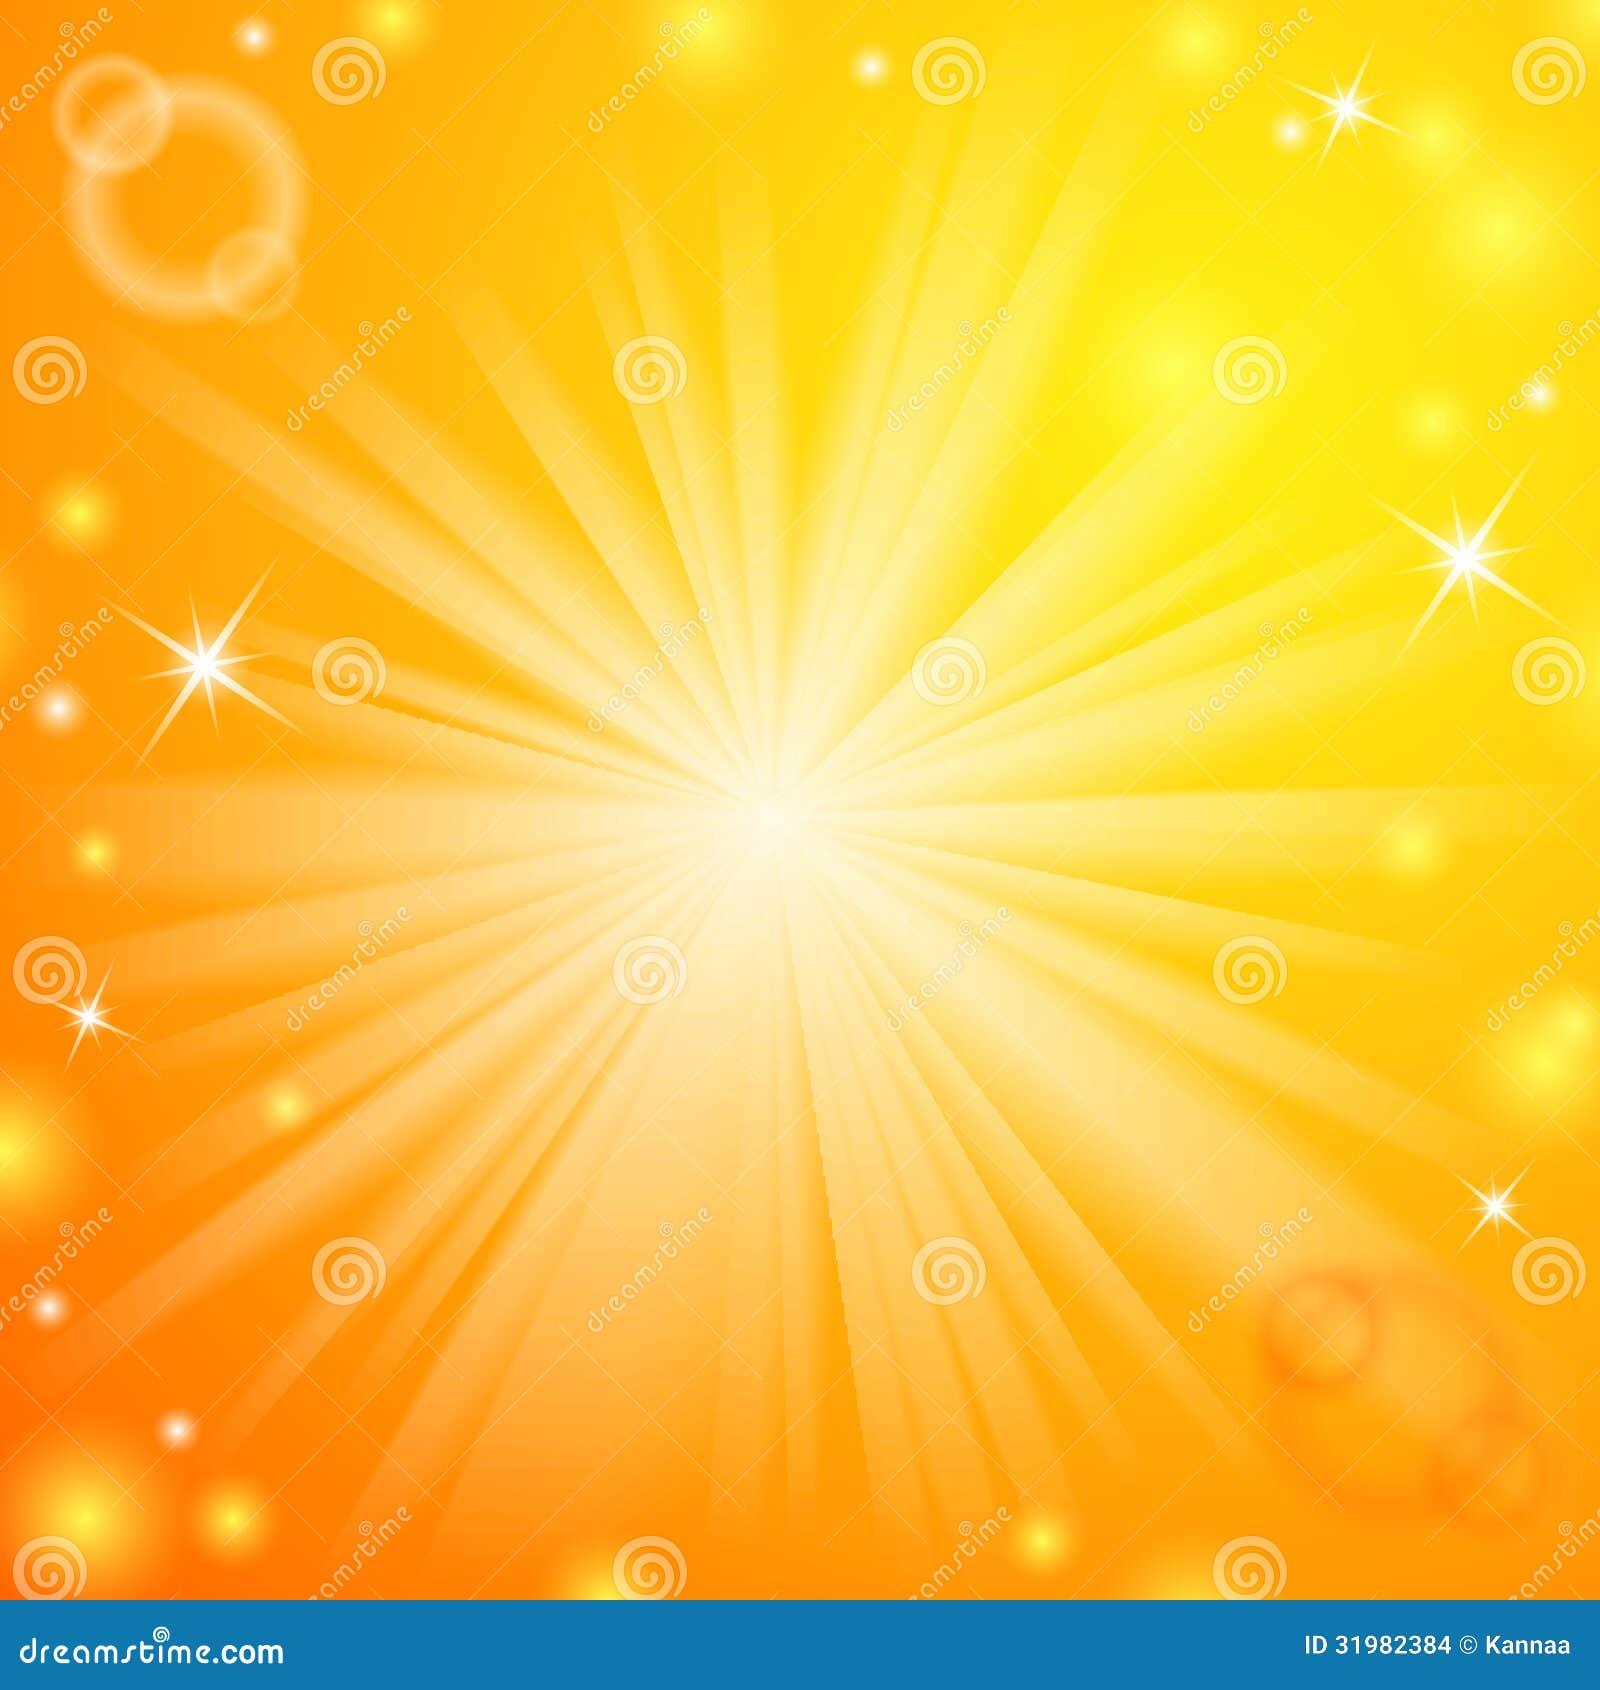 Abstract Magic Light Orange Background Stock Vector - Illustration ... for Light Orange Background Wallpaper  111bof